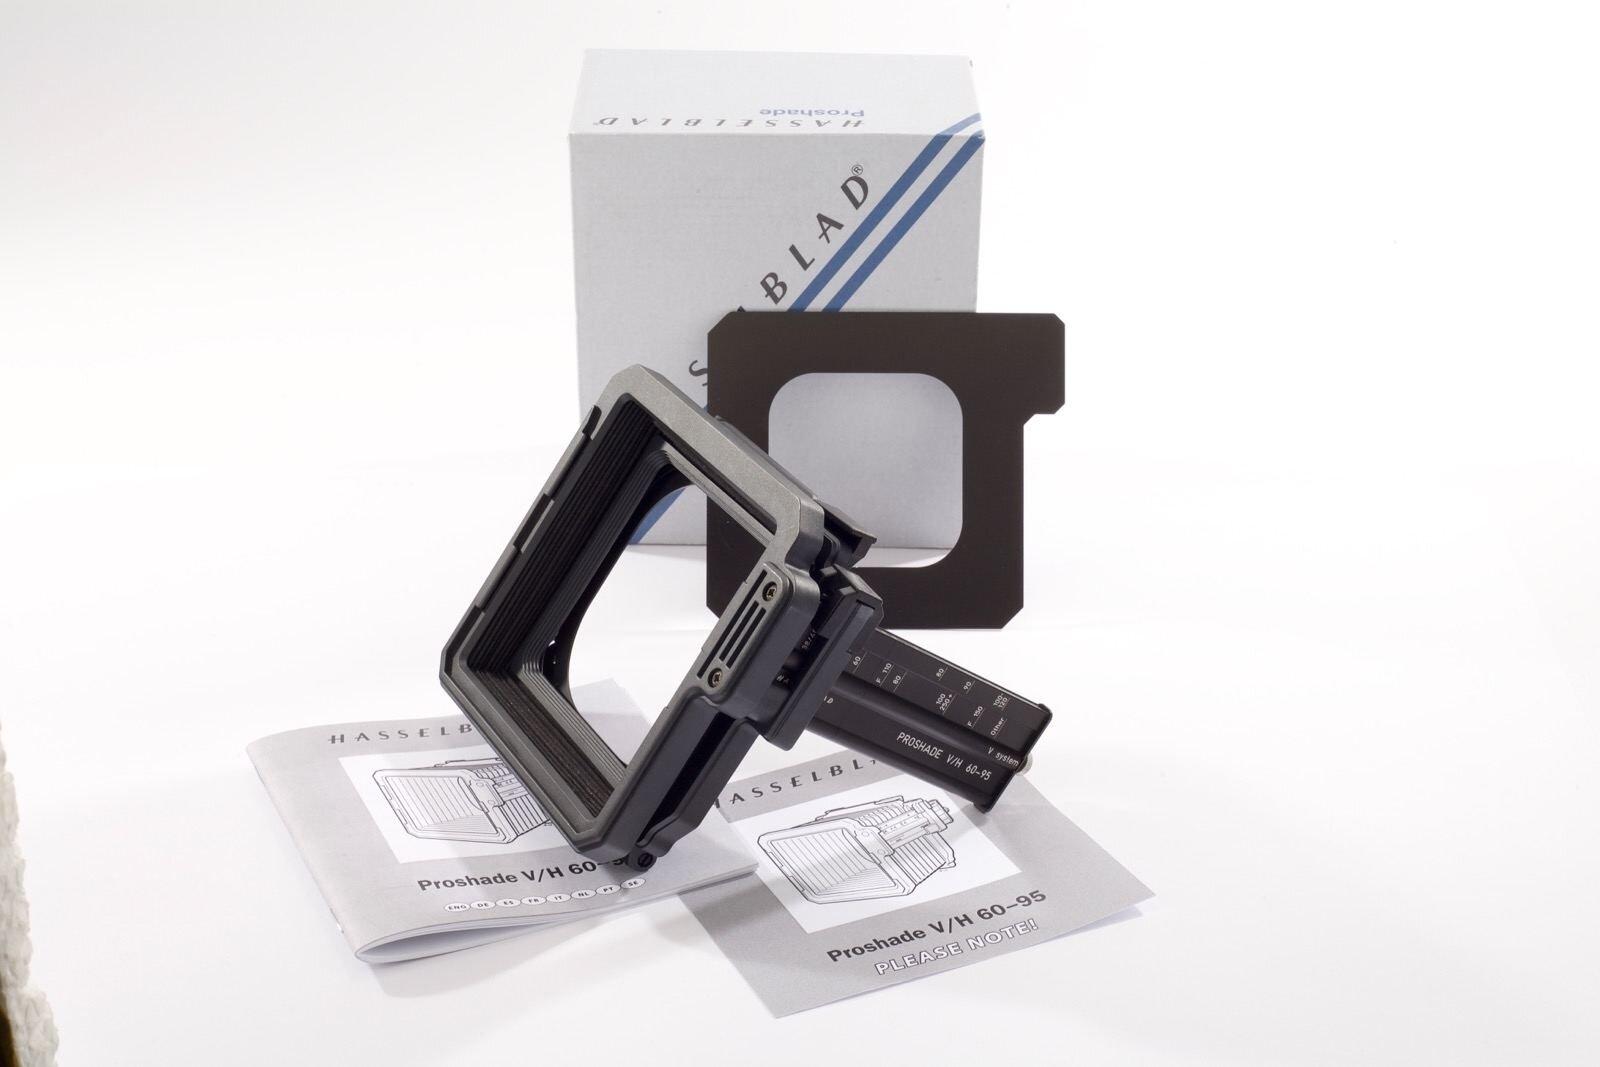 Hasselblad H-System PROSHADE V/H 60-95 Kompendium